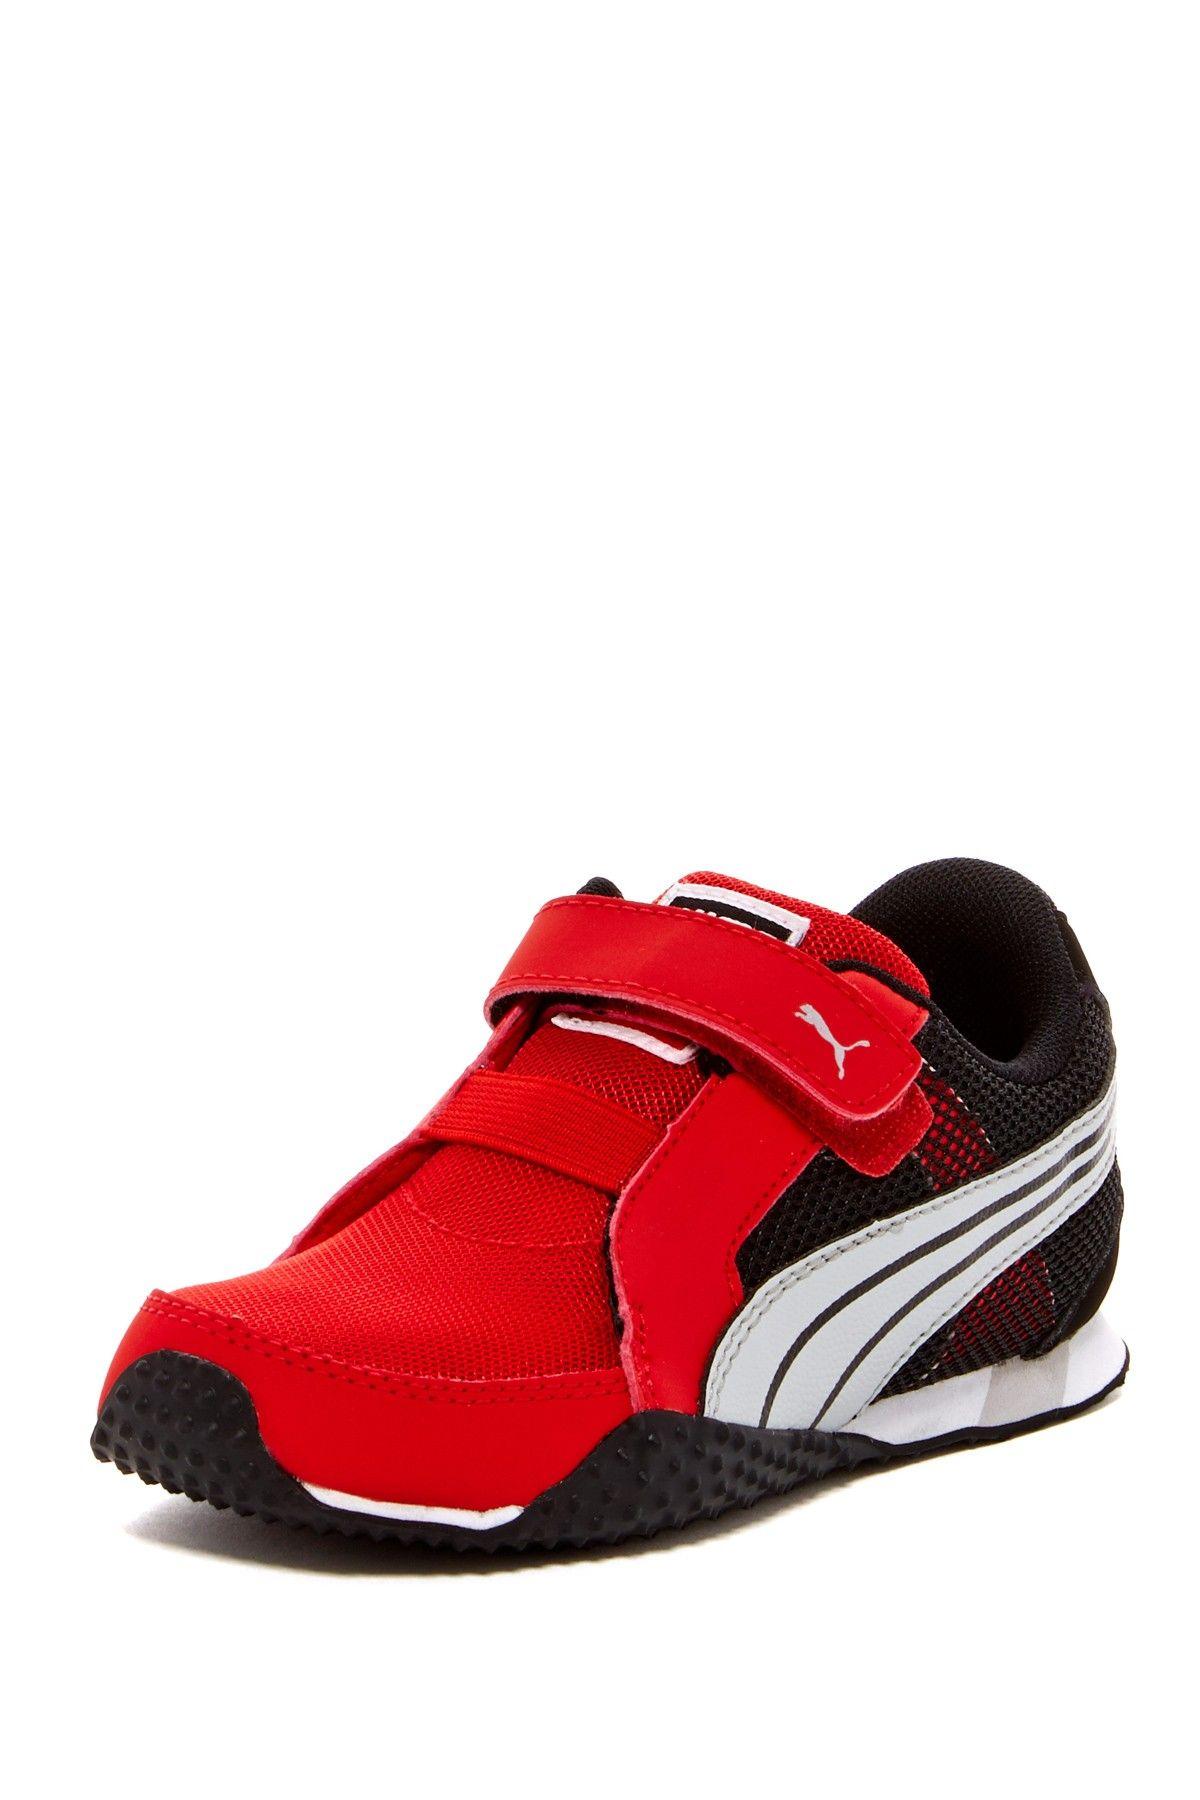 Geox Kids Fighter 27 Light-Up Sneaker Toddler//Little Kid//Big Kid